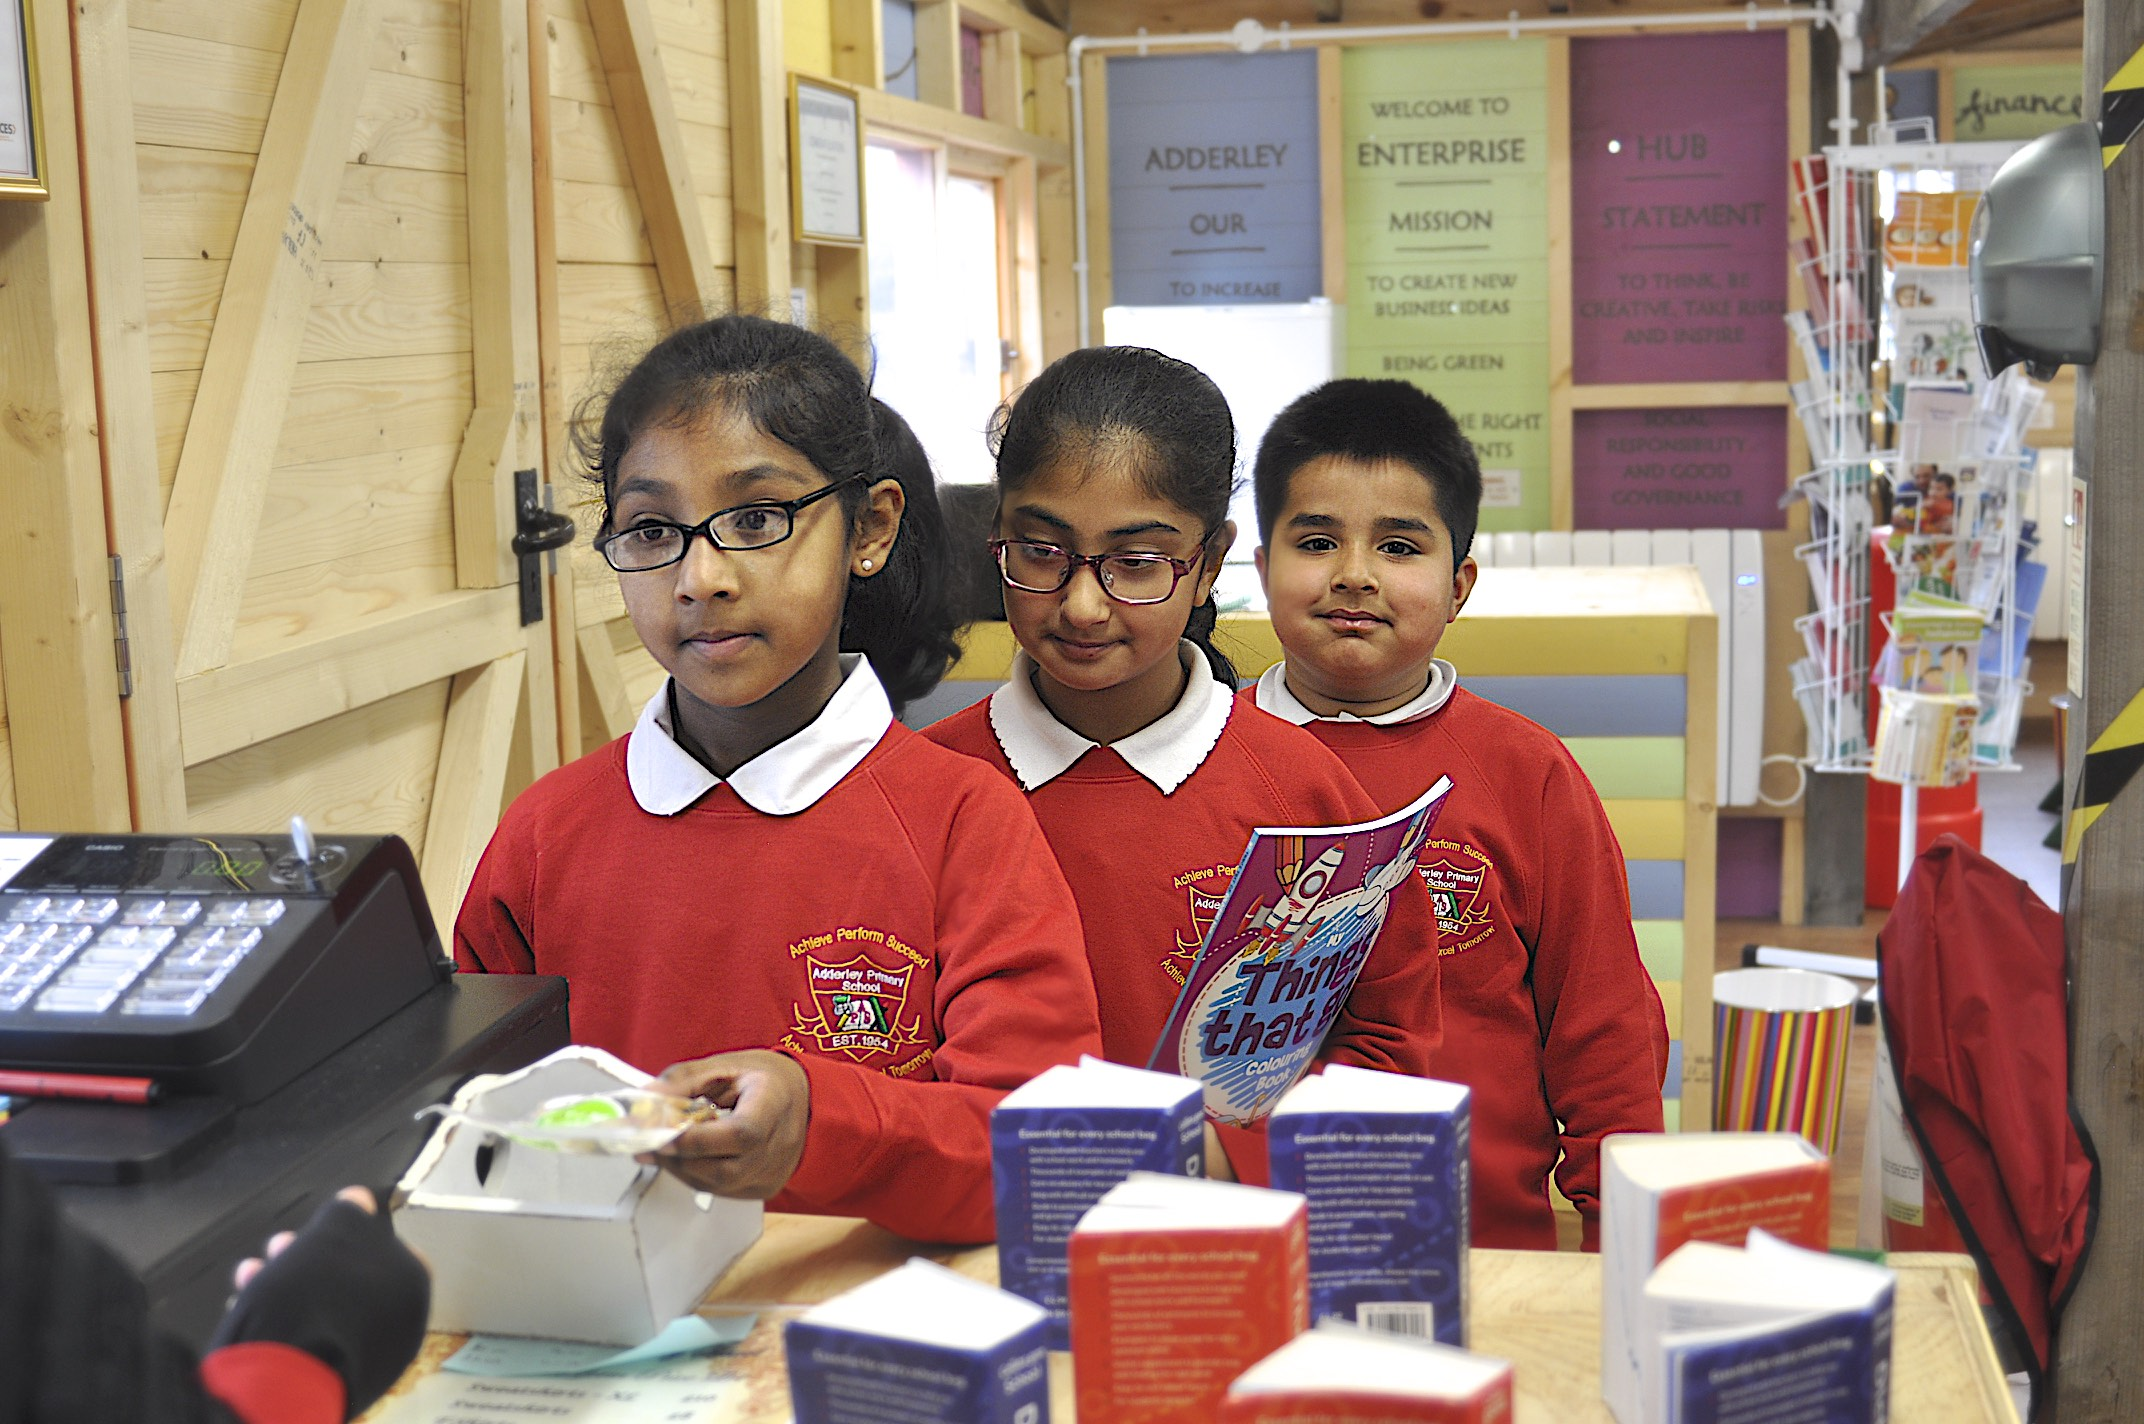 d9b7bc3bf23 Enterprise Hub - Adderley Primary SchoolAdderley Primary School